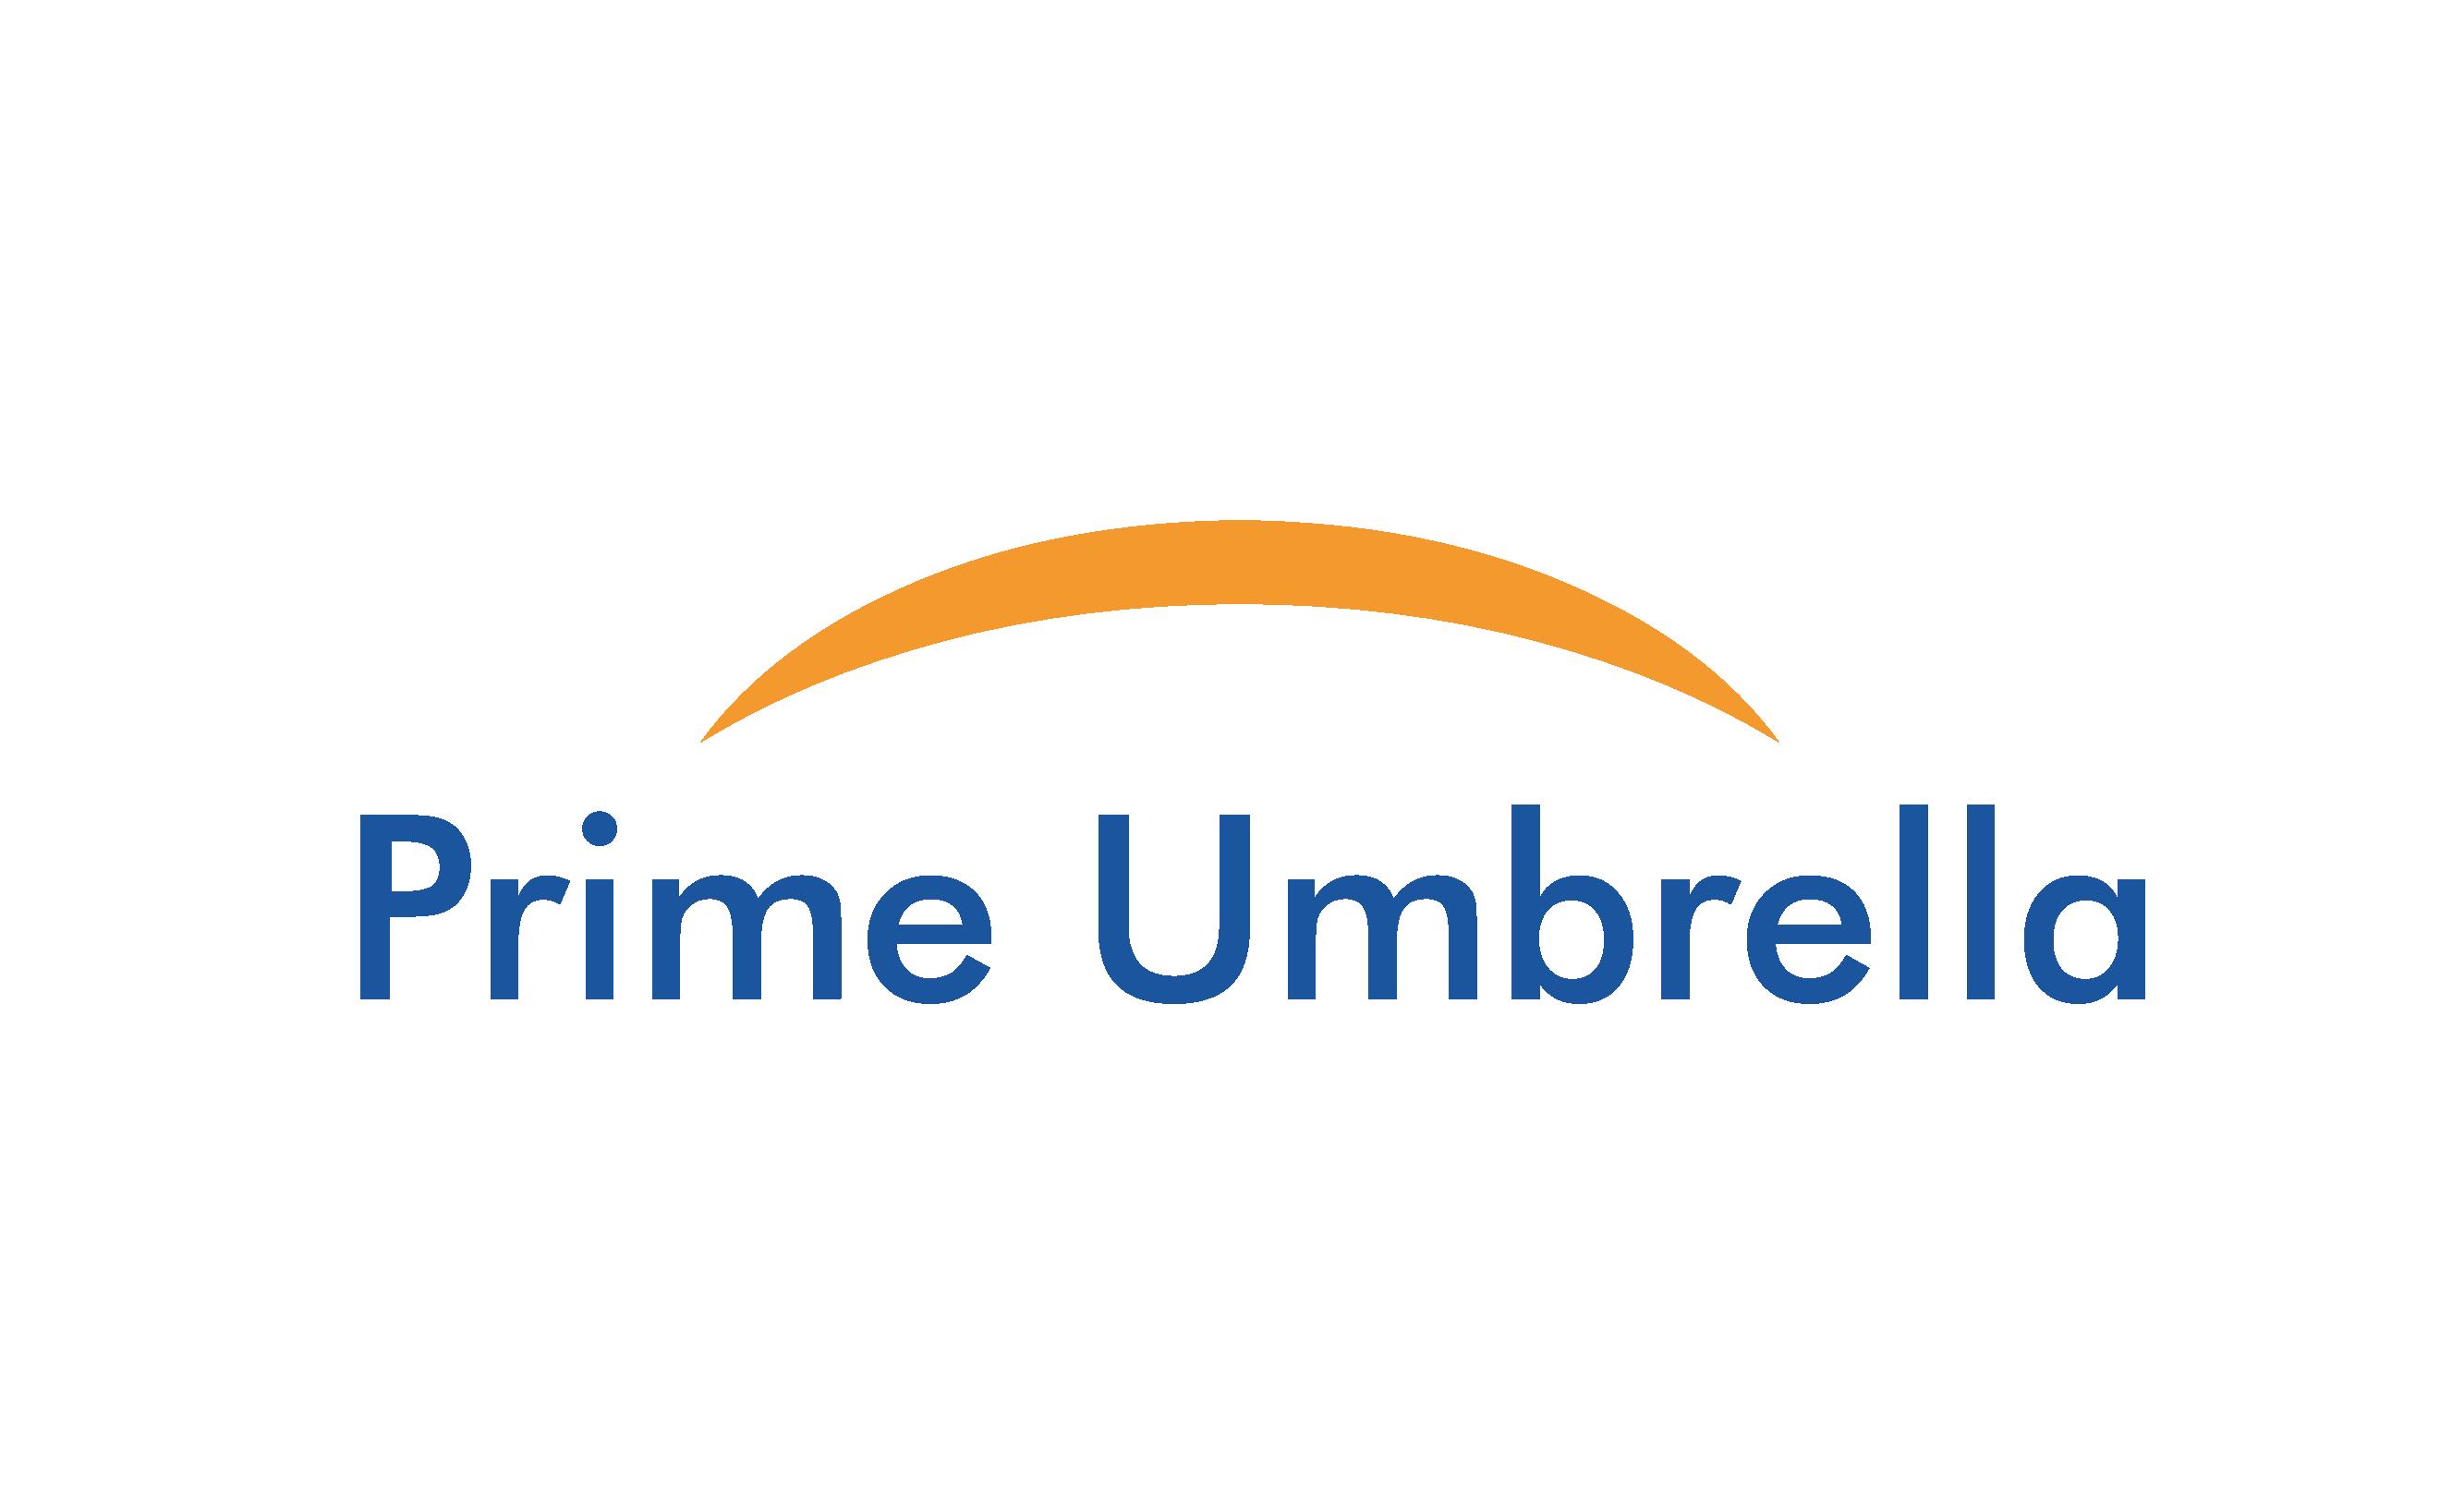 Prime Umbrella